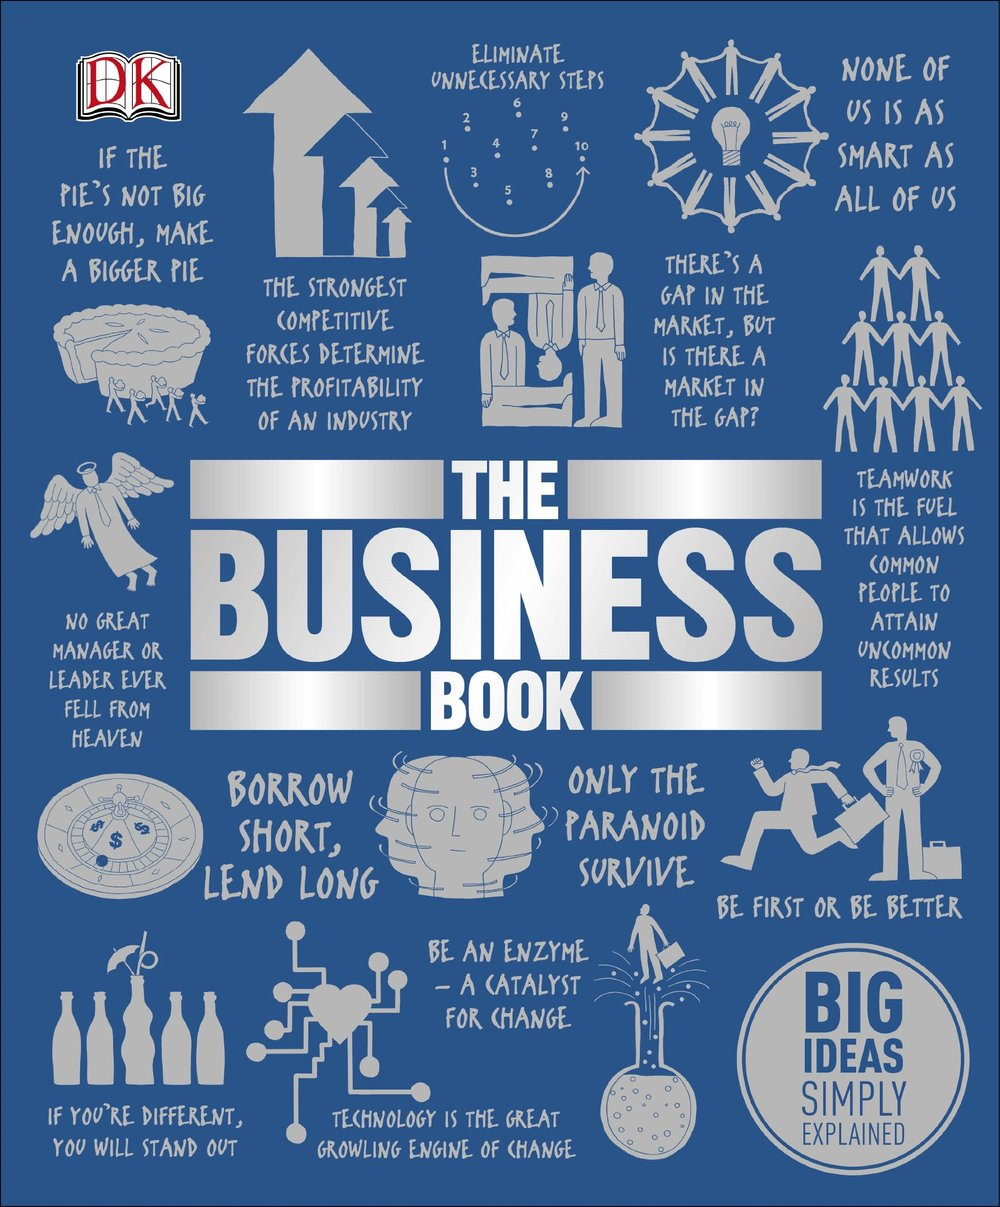 Books DK Big Ideas The Business Book.jpg